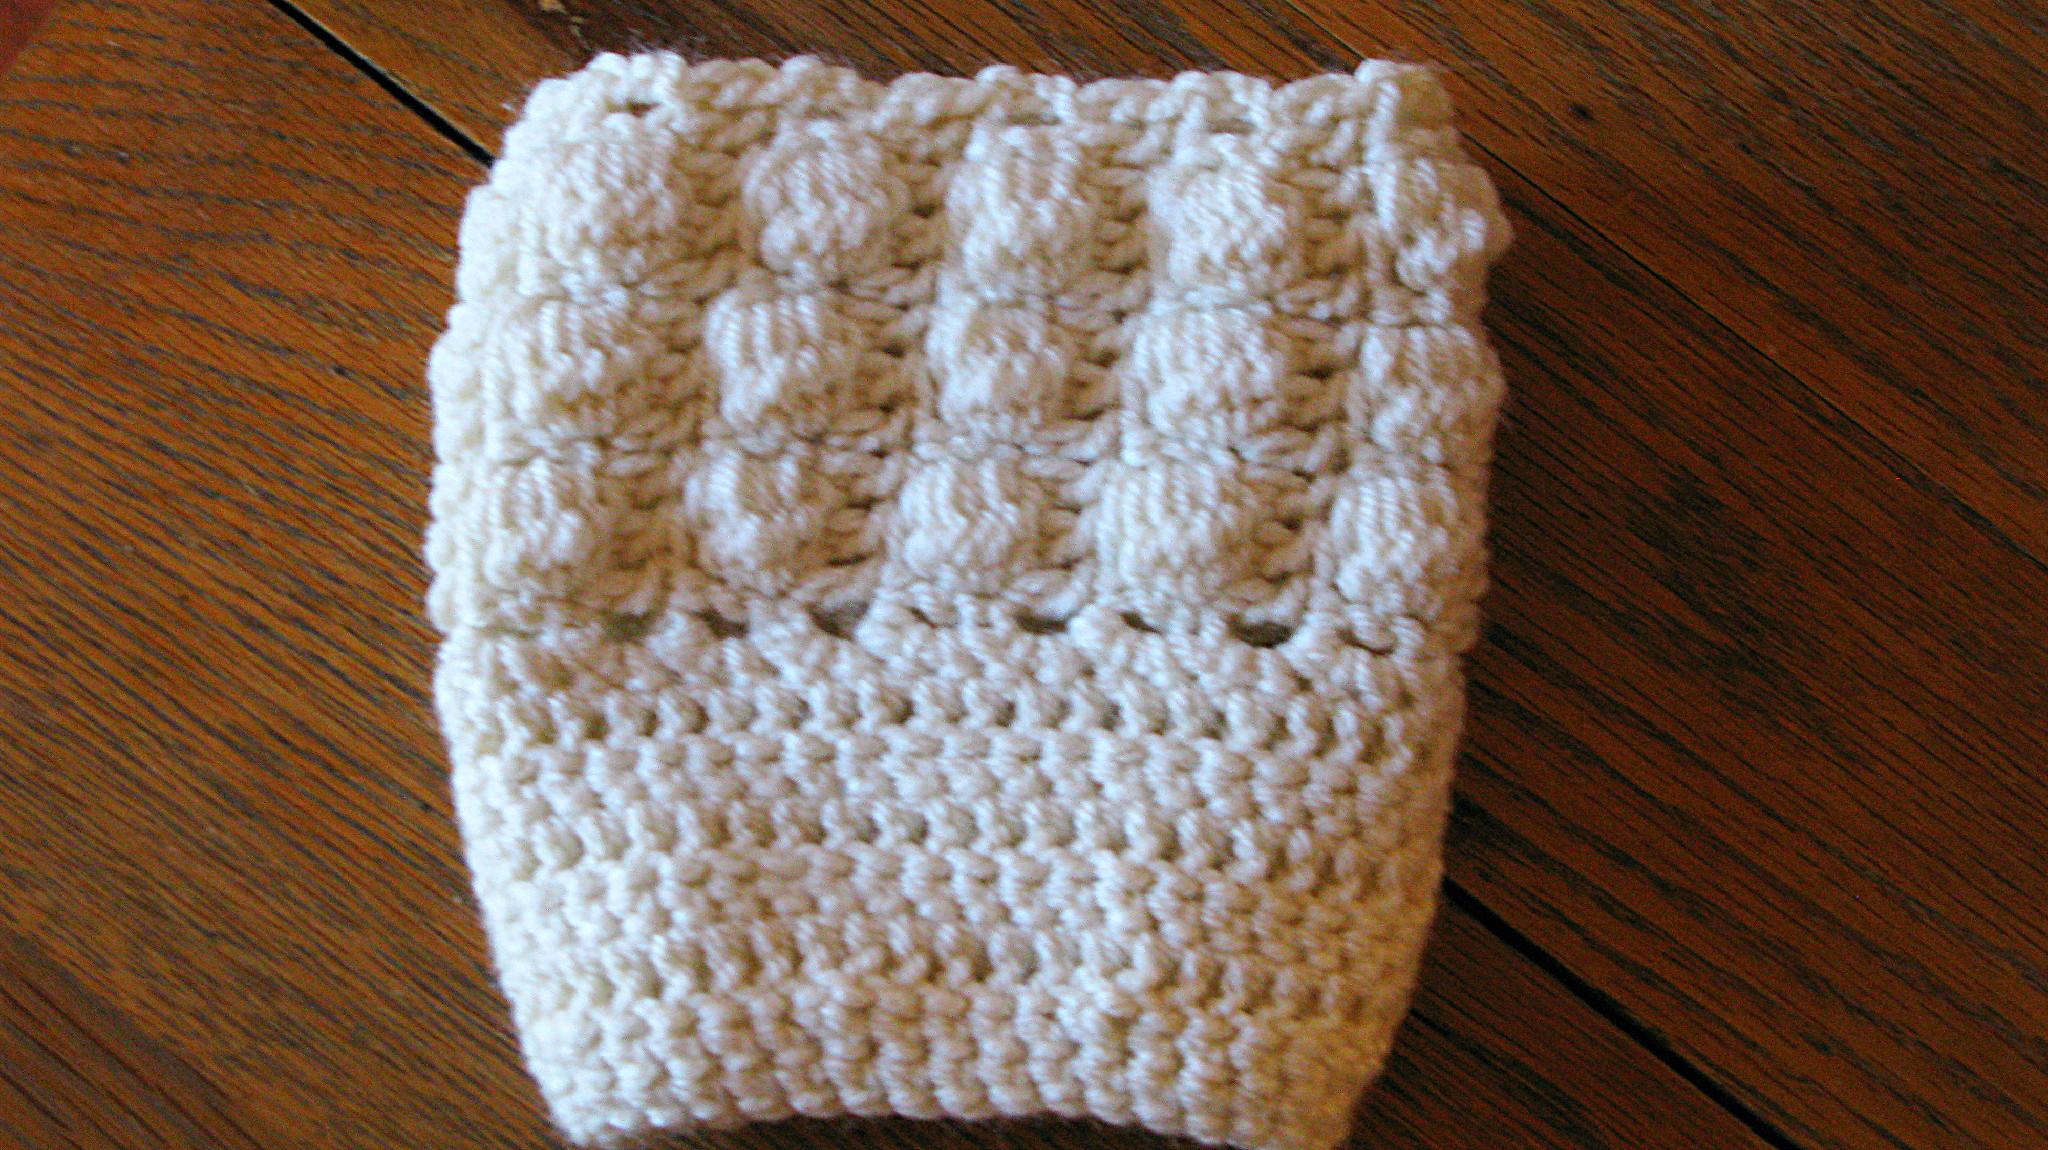 Crochet Hat Pattern With Cuff : Boot Cuff Patterns ELK Studio ? Handcrafted Crochet Designs